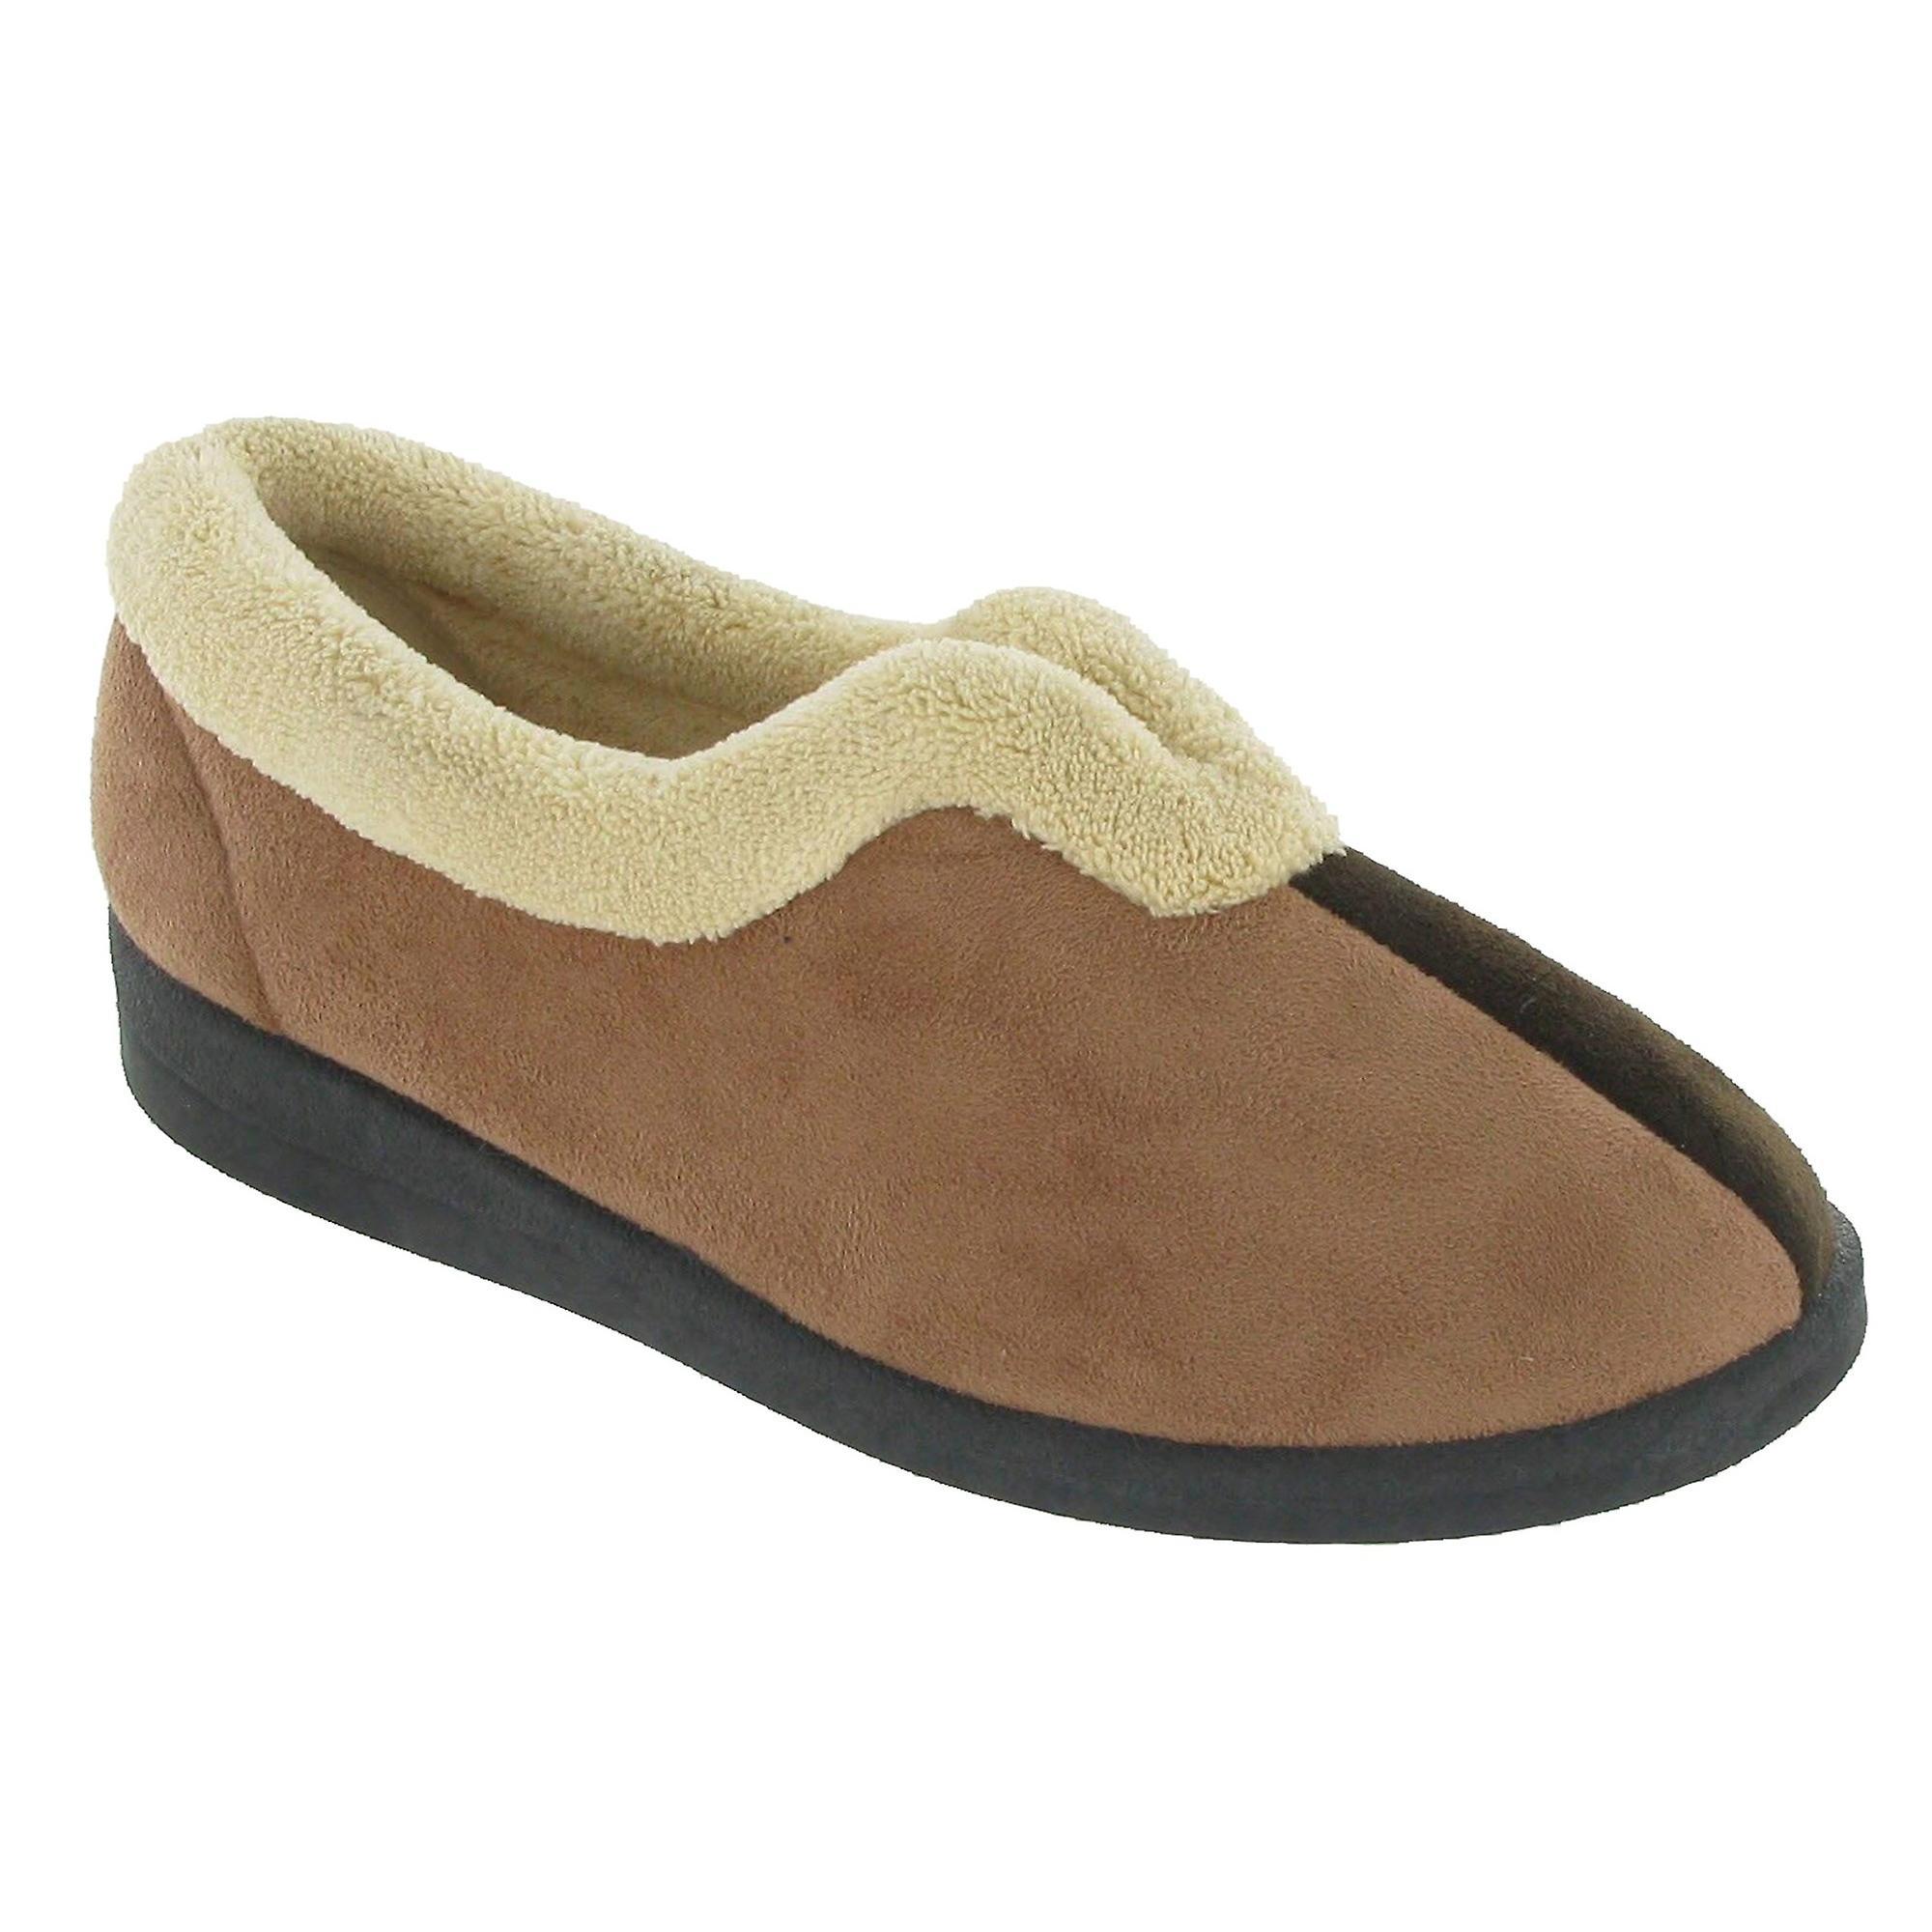 Mirak Jenny Ladies Slipper / Classic Womens Slippers